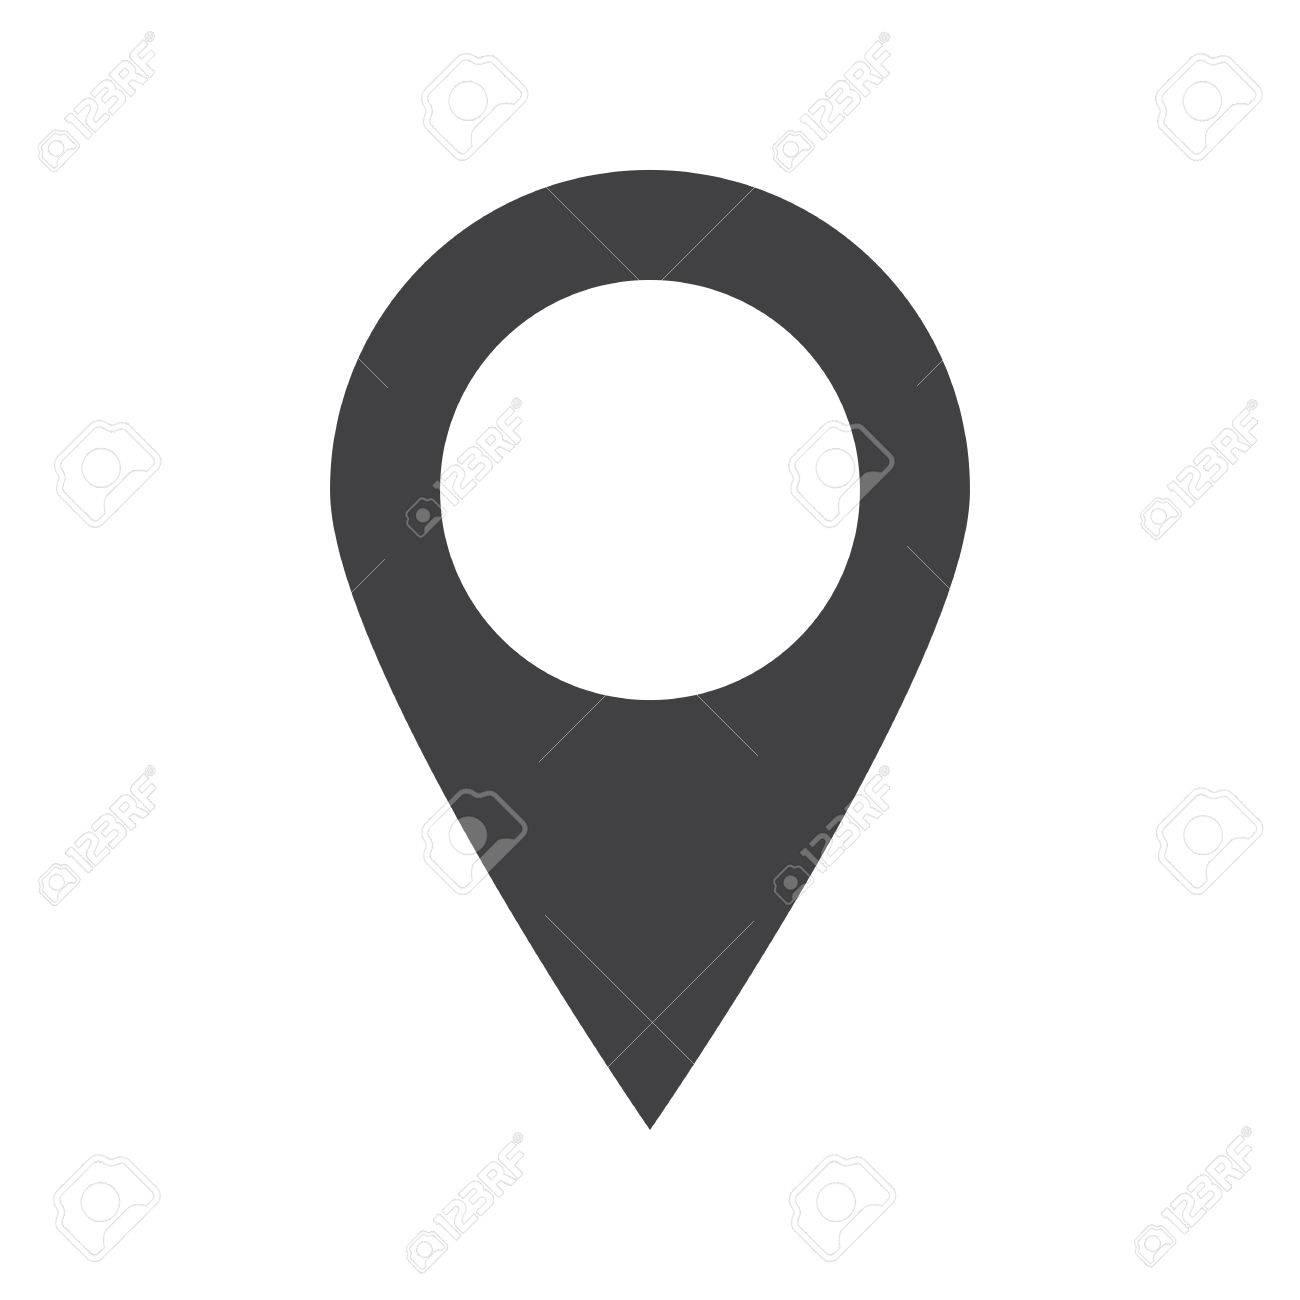 Map pointer icon (flat design) - 35163001